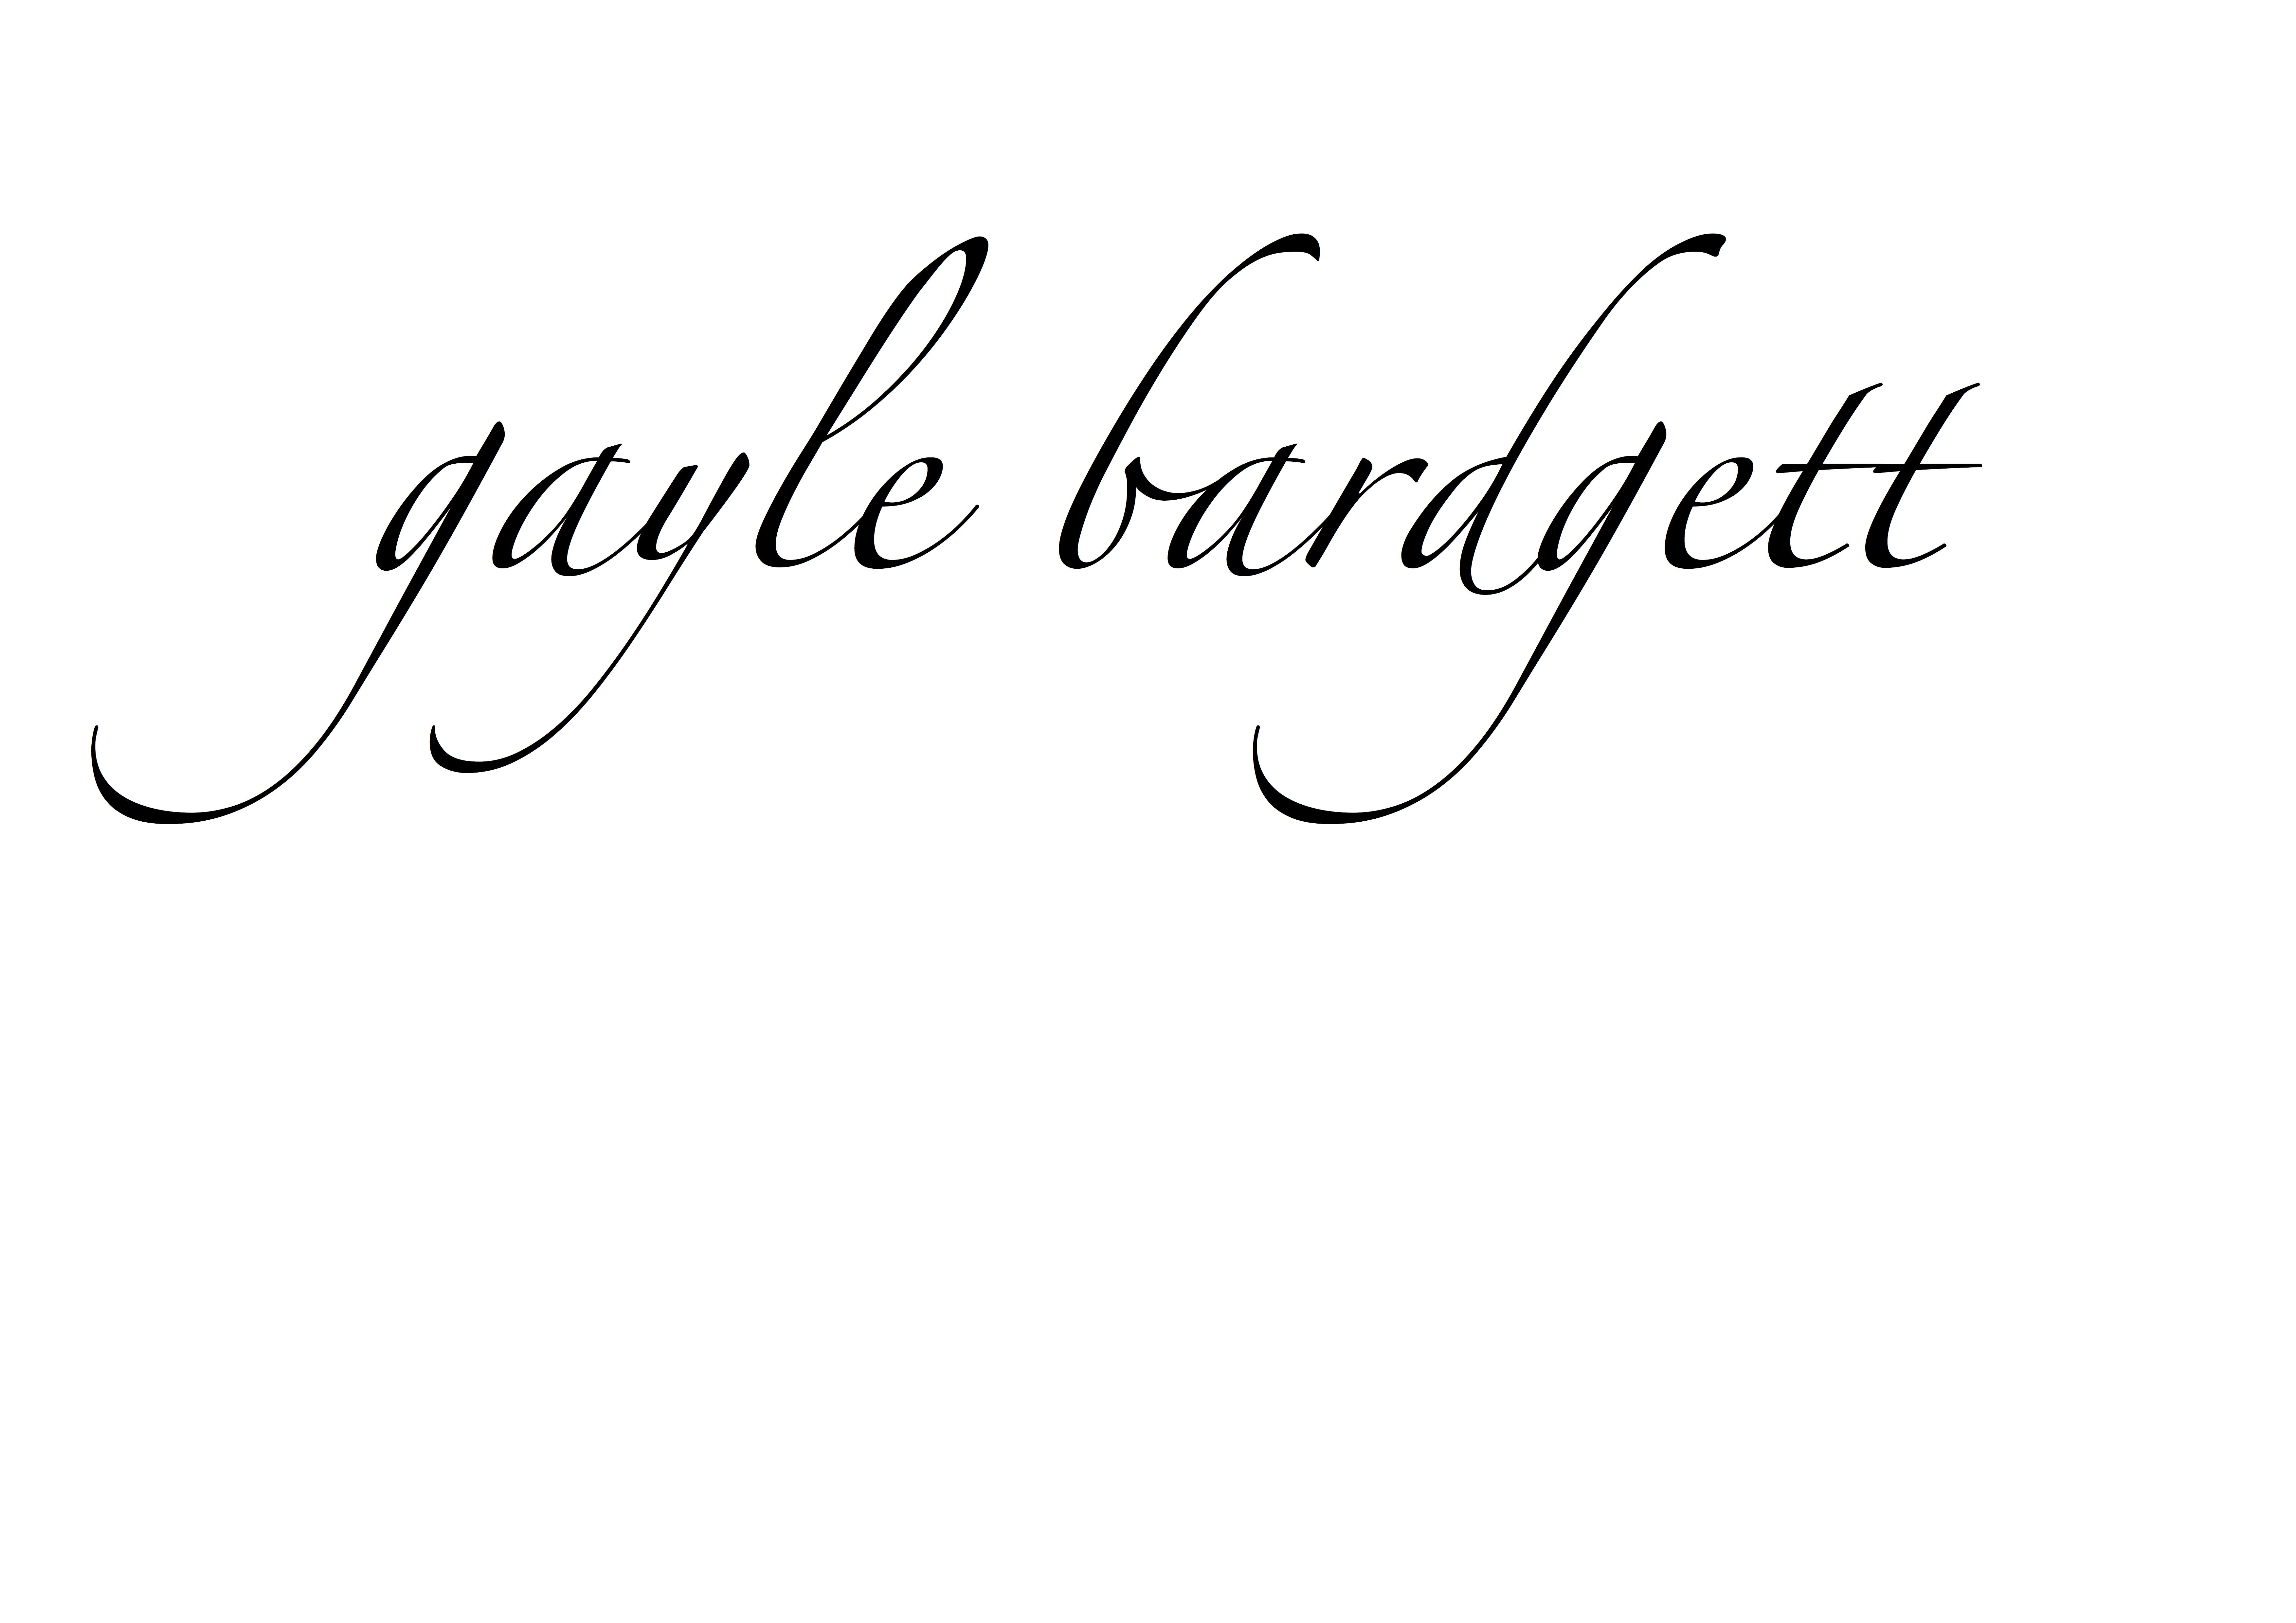 Gayle Bardgett Signature